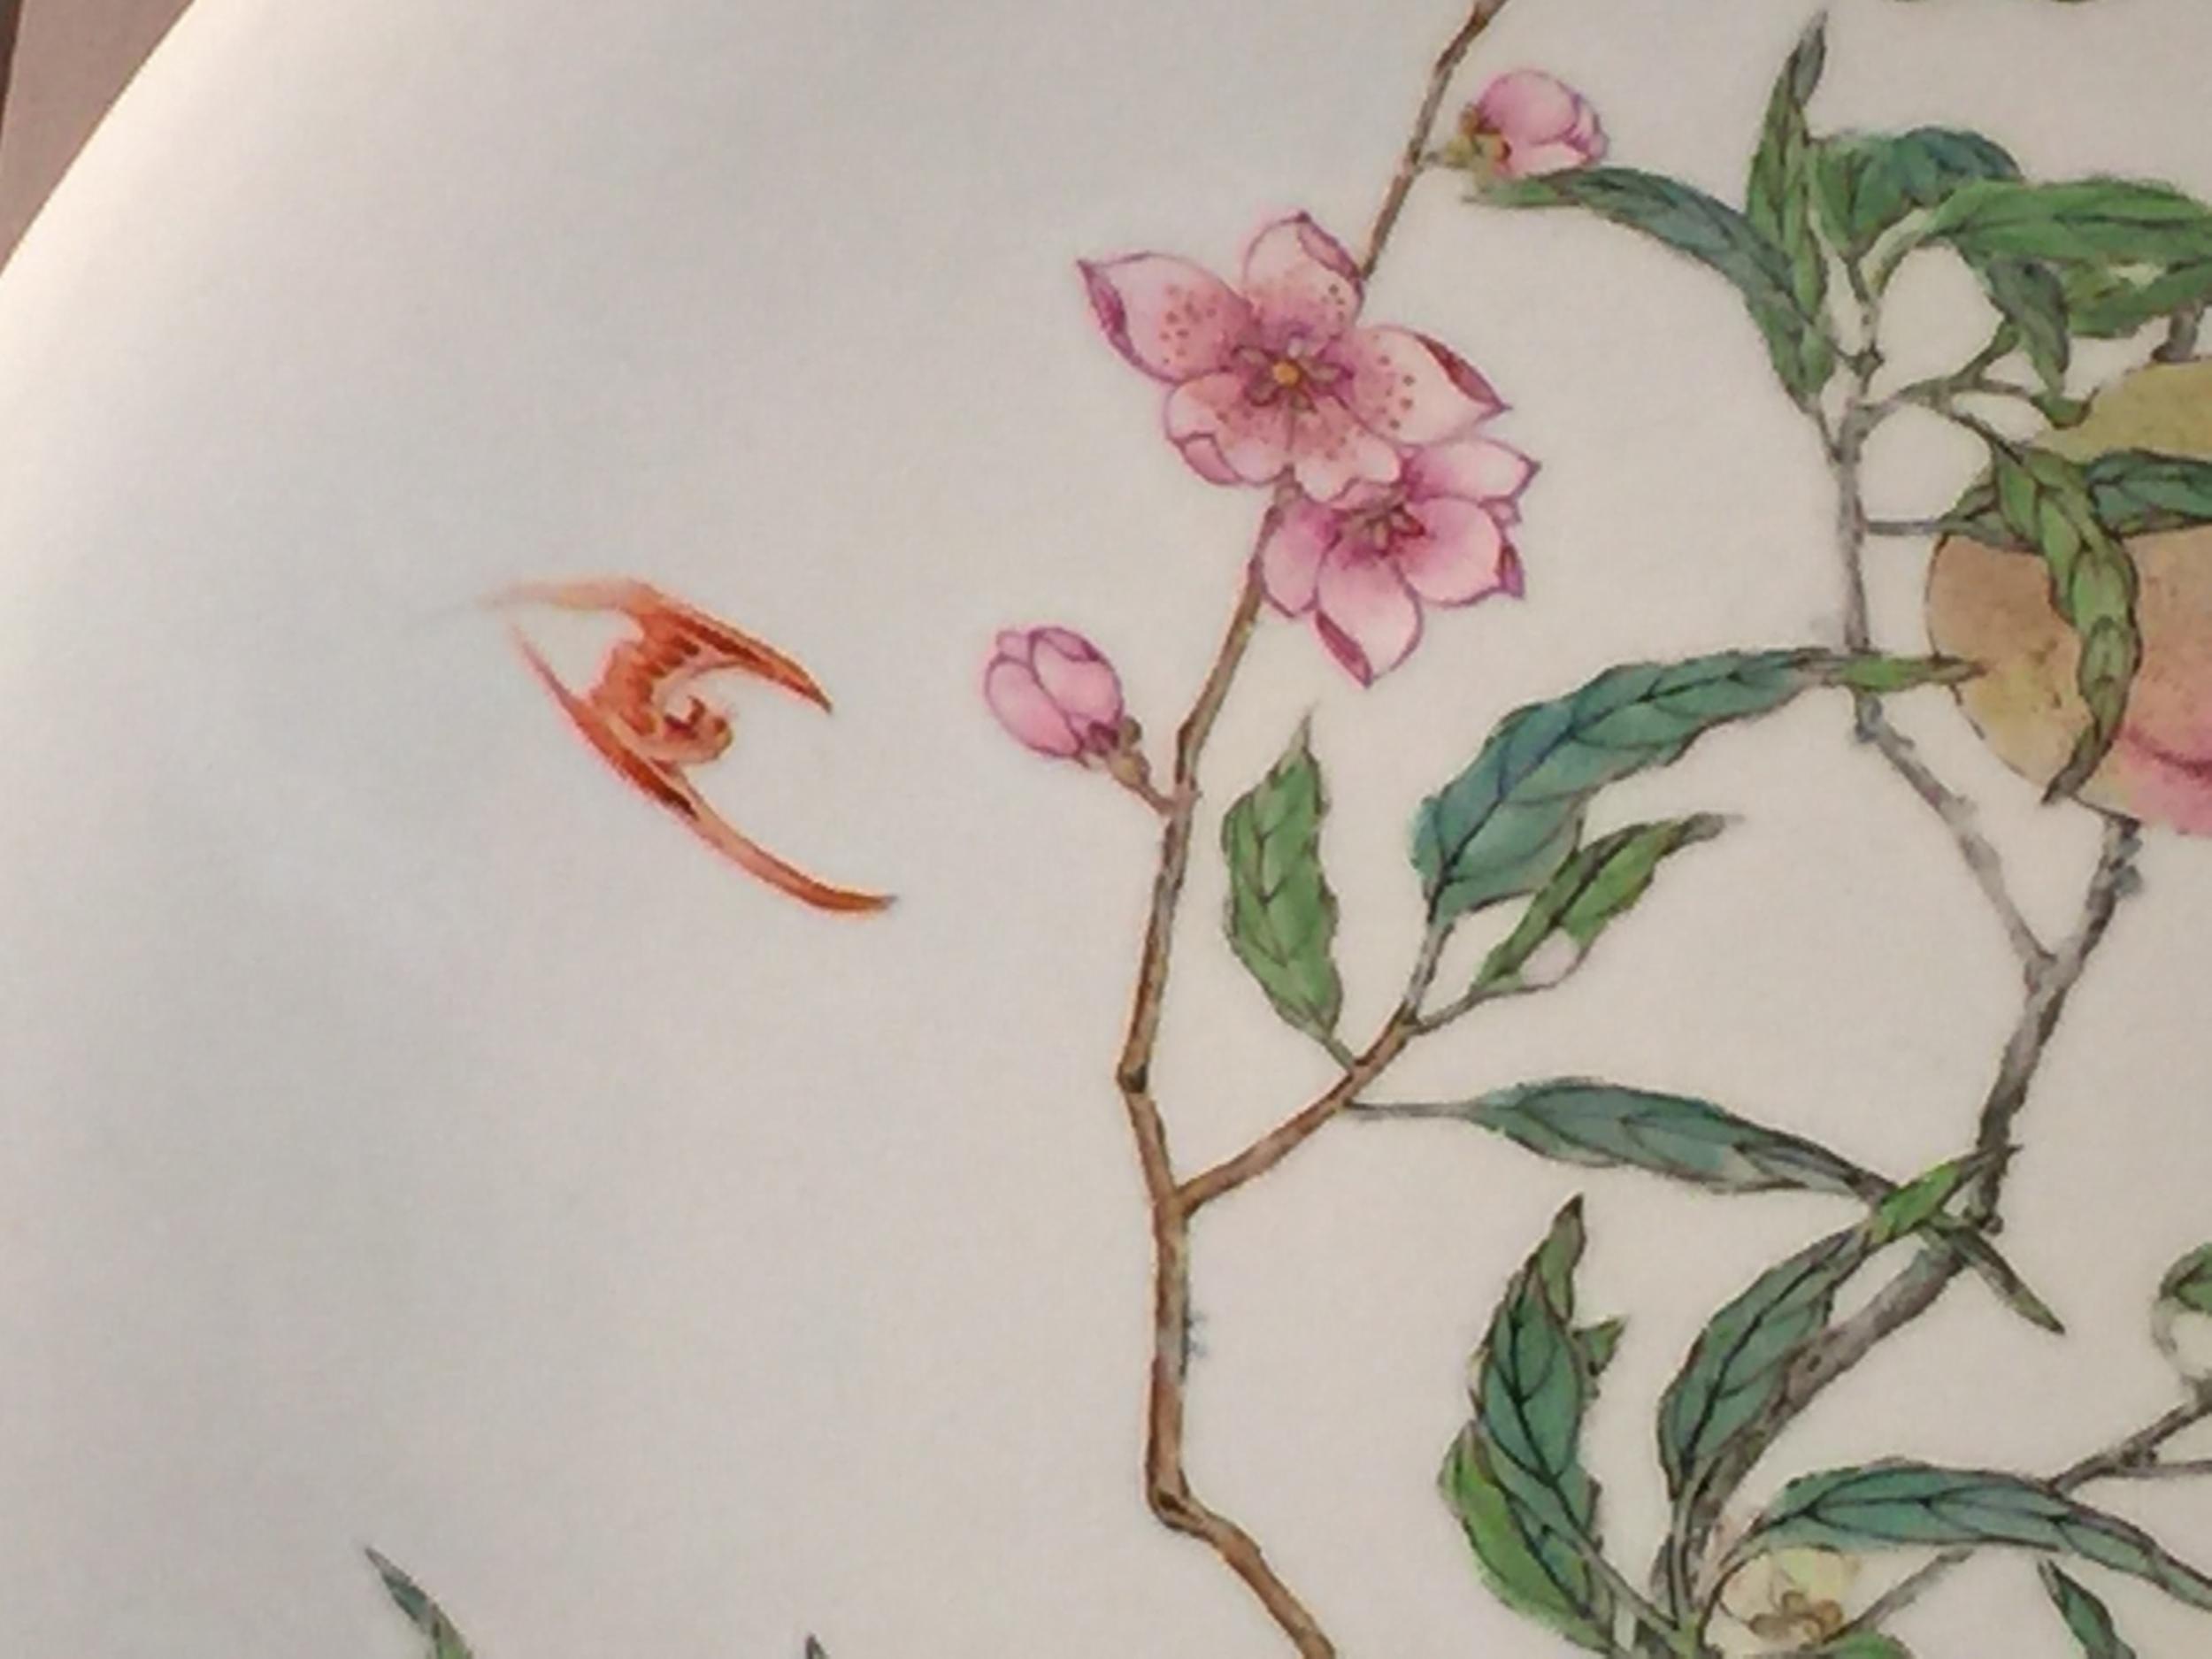 Chinese-Porcelain-British-Museum-Percival-David-jessewaugh.com-78.jpg